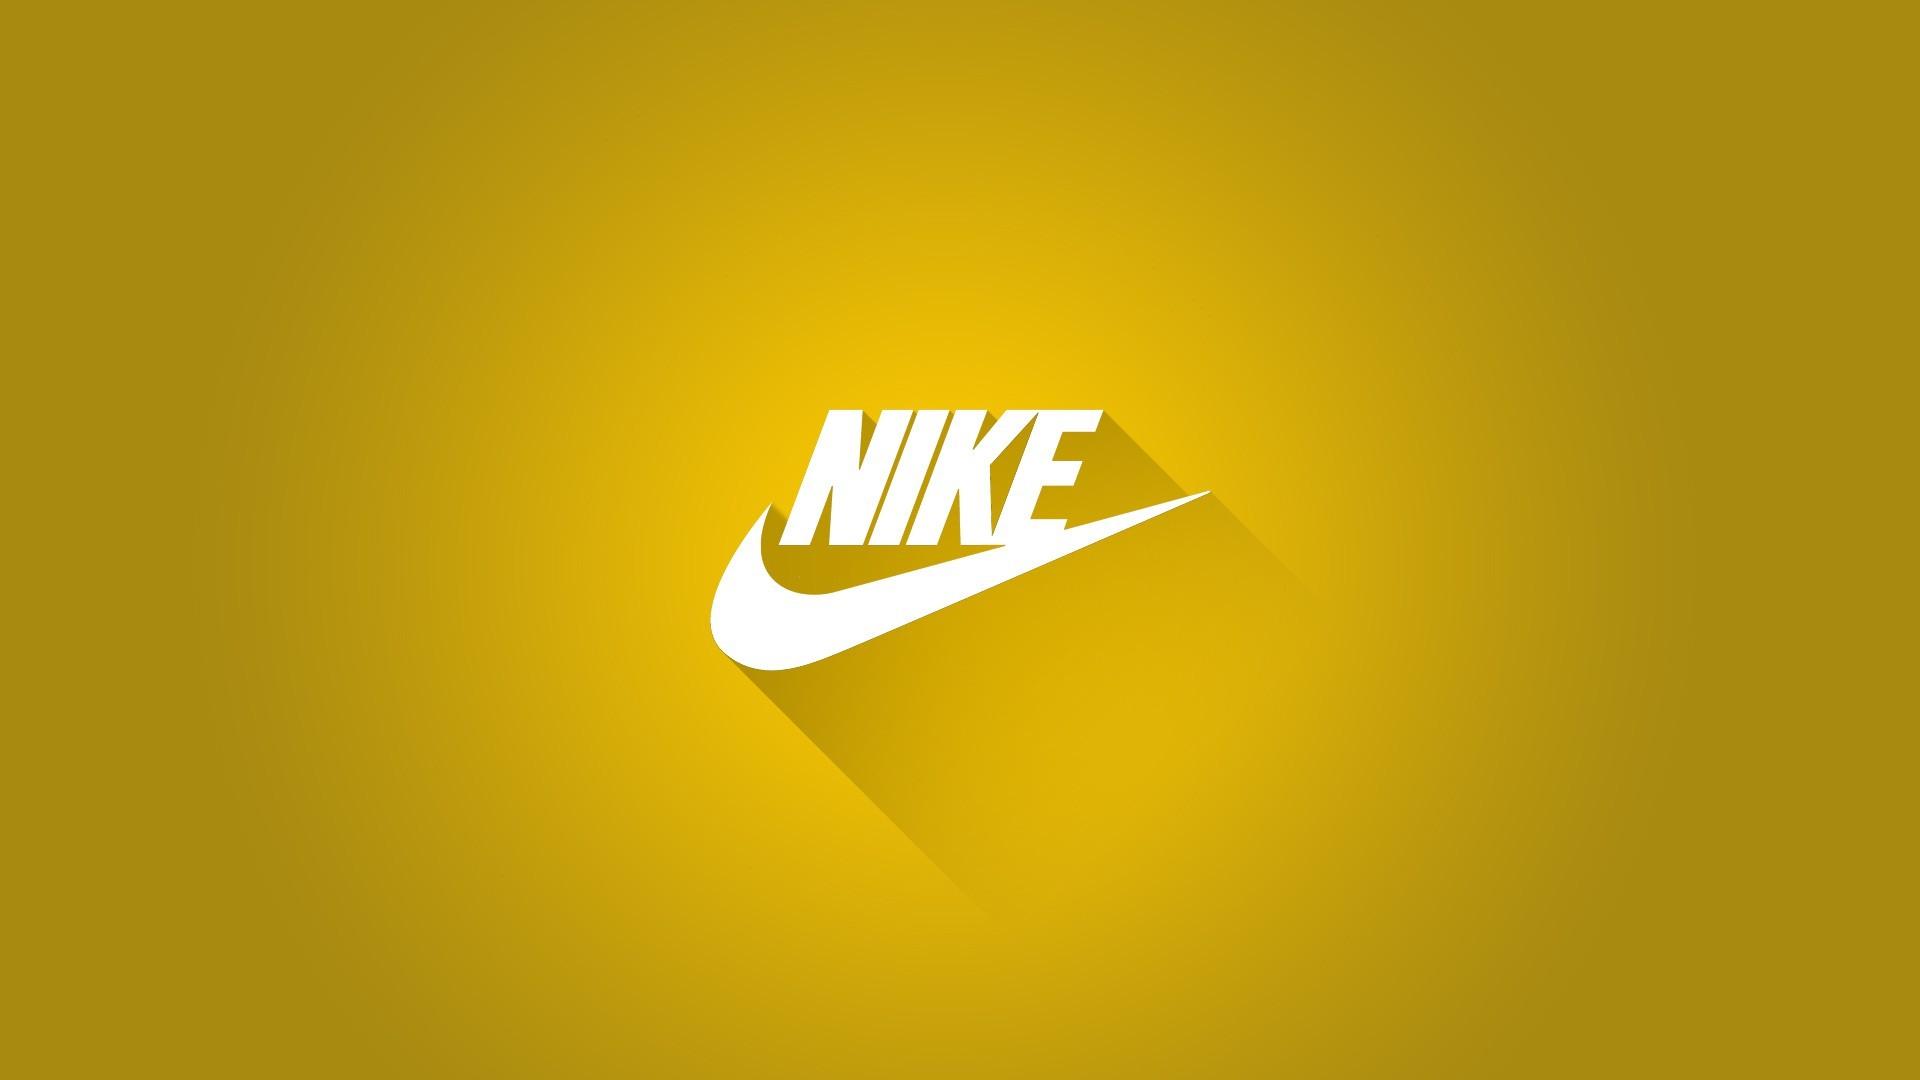 Nike, Logo wallpaper thumb